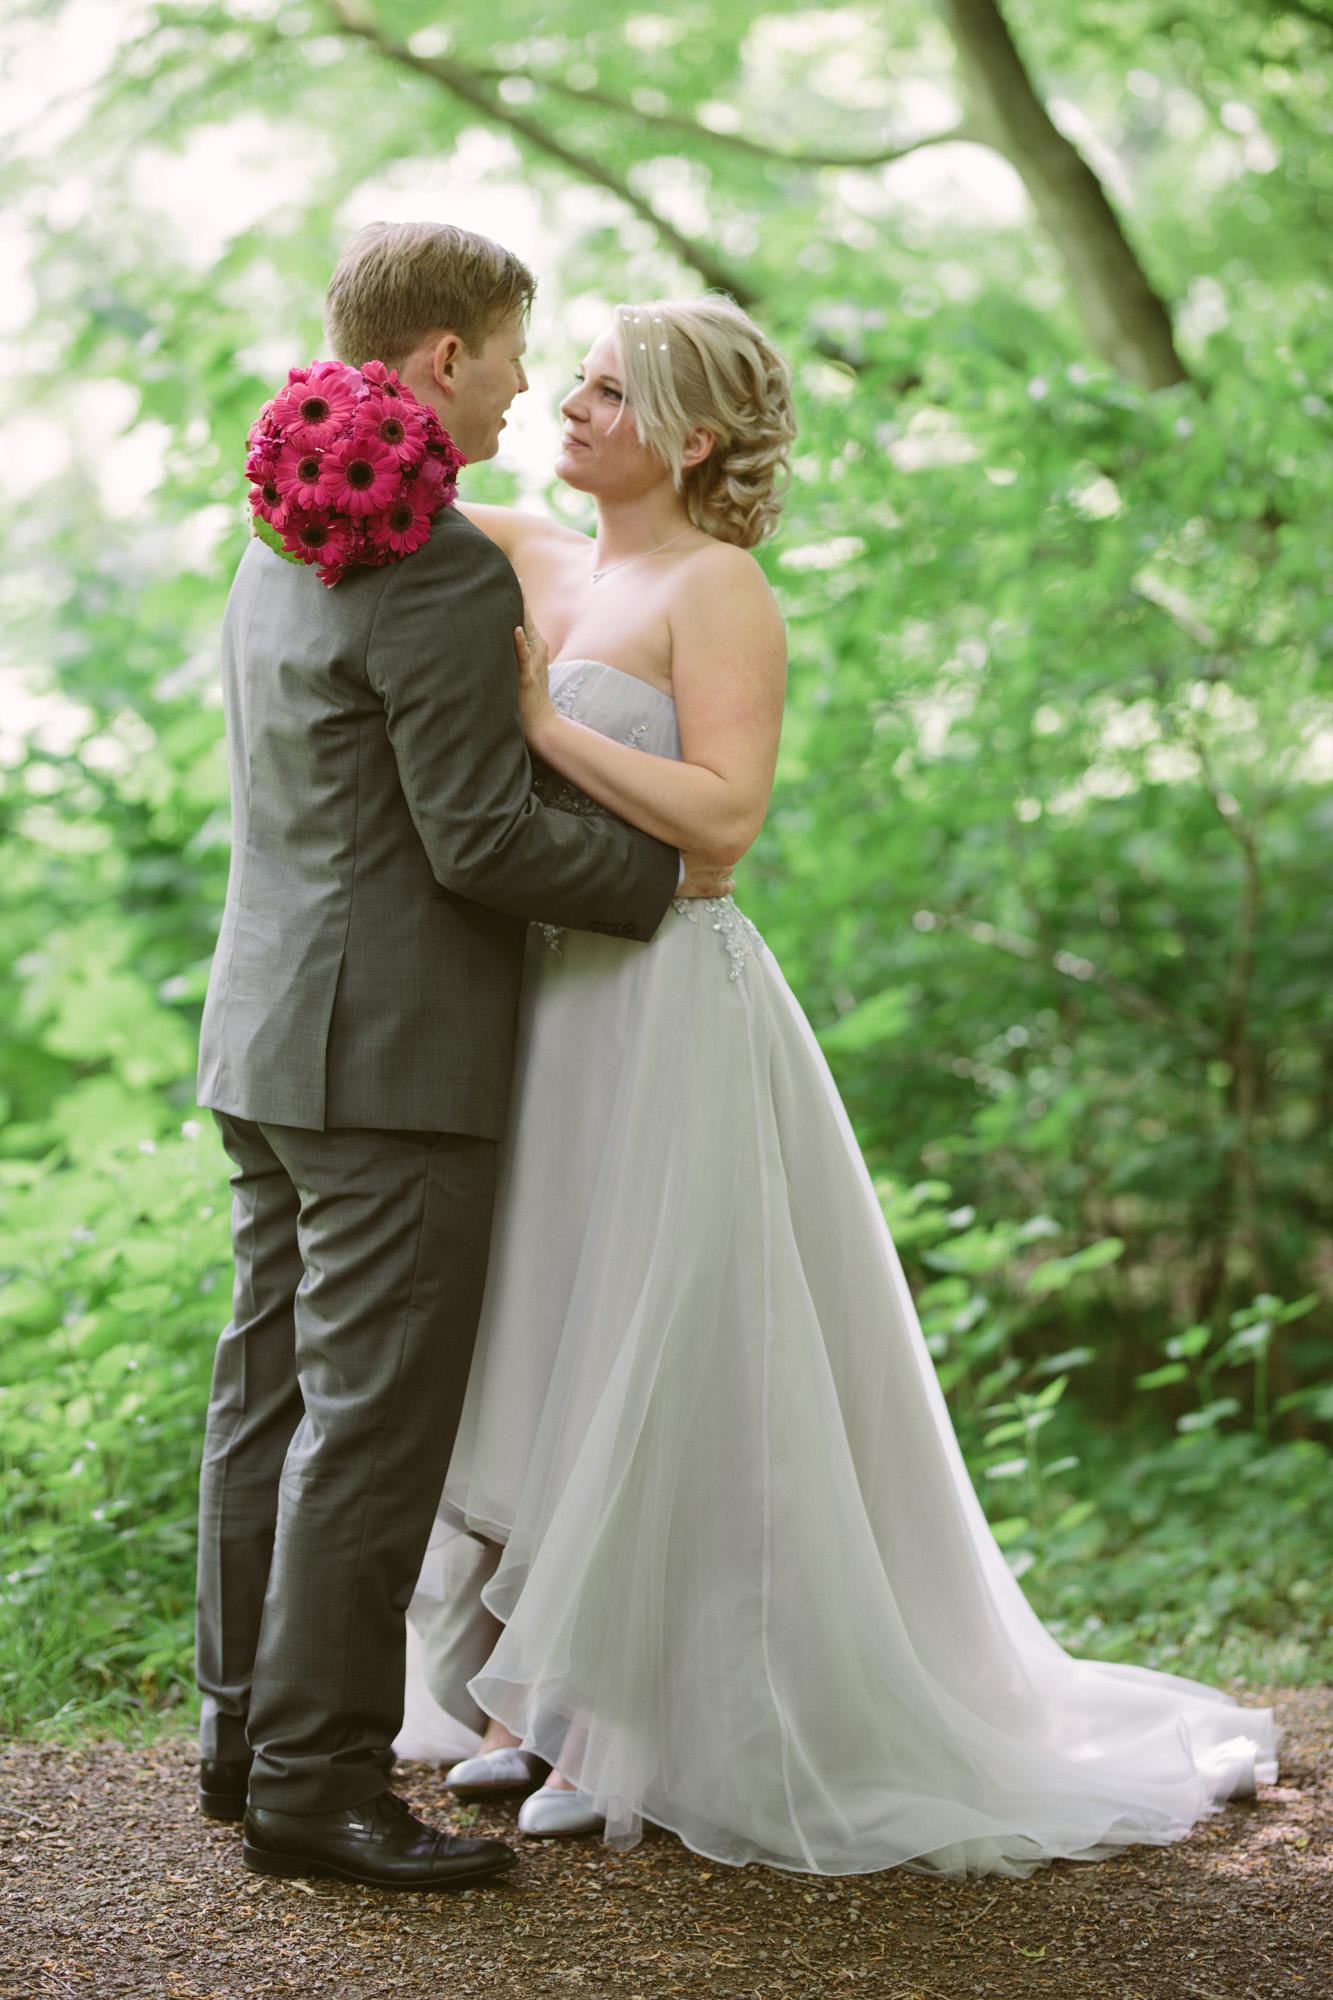 Claudia-Krawinkel-Hochzeitsfotografie-Essen-Duisburg-Standesamt-Schloss-Borbeck-26